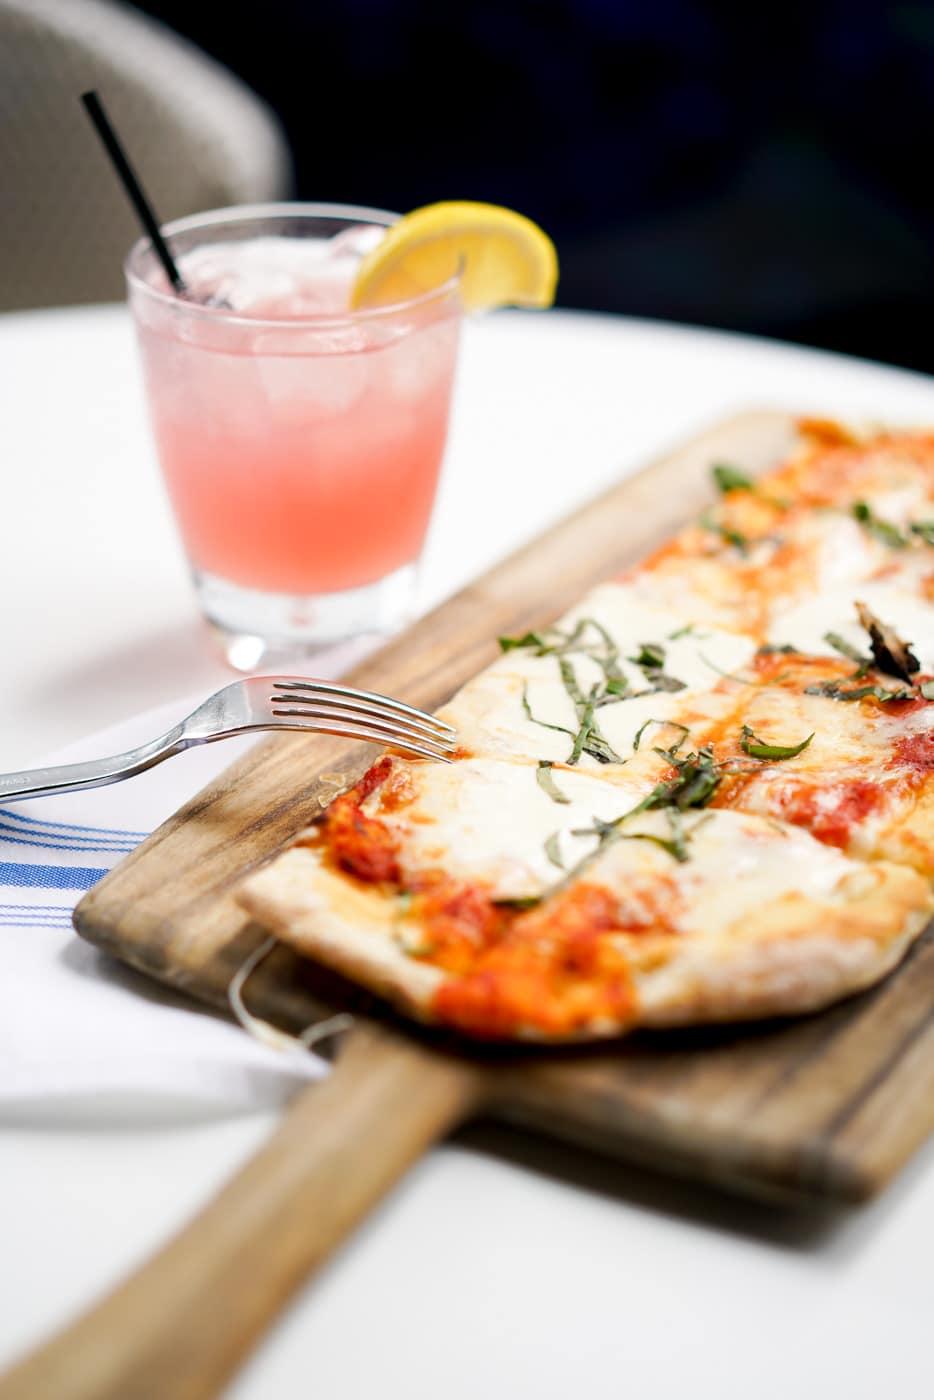 Filini Restaurant, Radisson Blu Aqua, Radisson Blu Aqua Review, Chicago Pet-friendly Hotels, A Lily Love Affair, Chicago Blogger